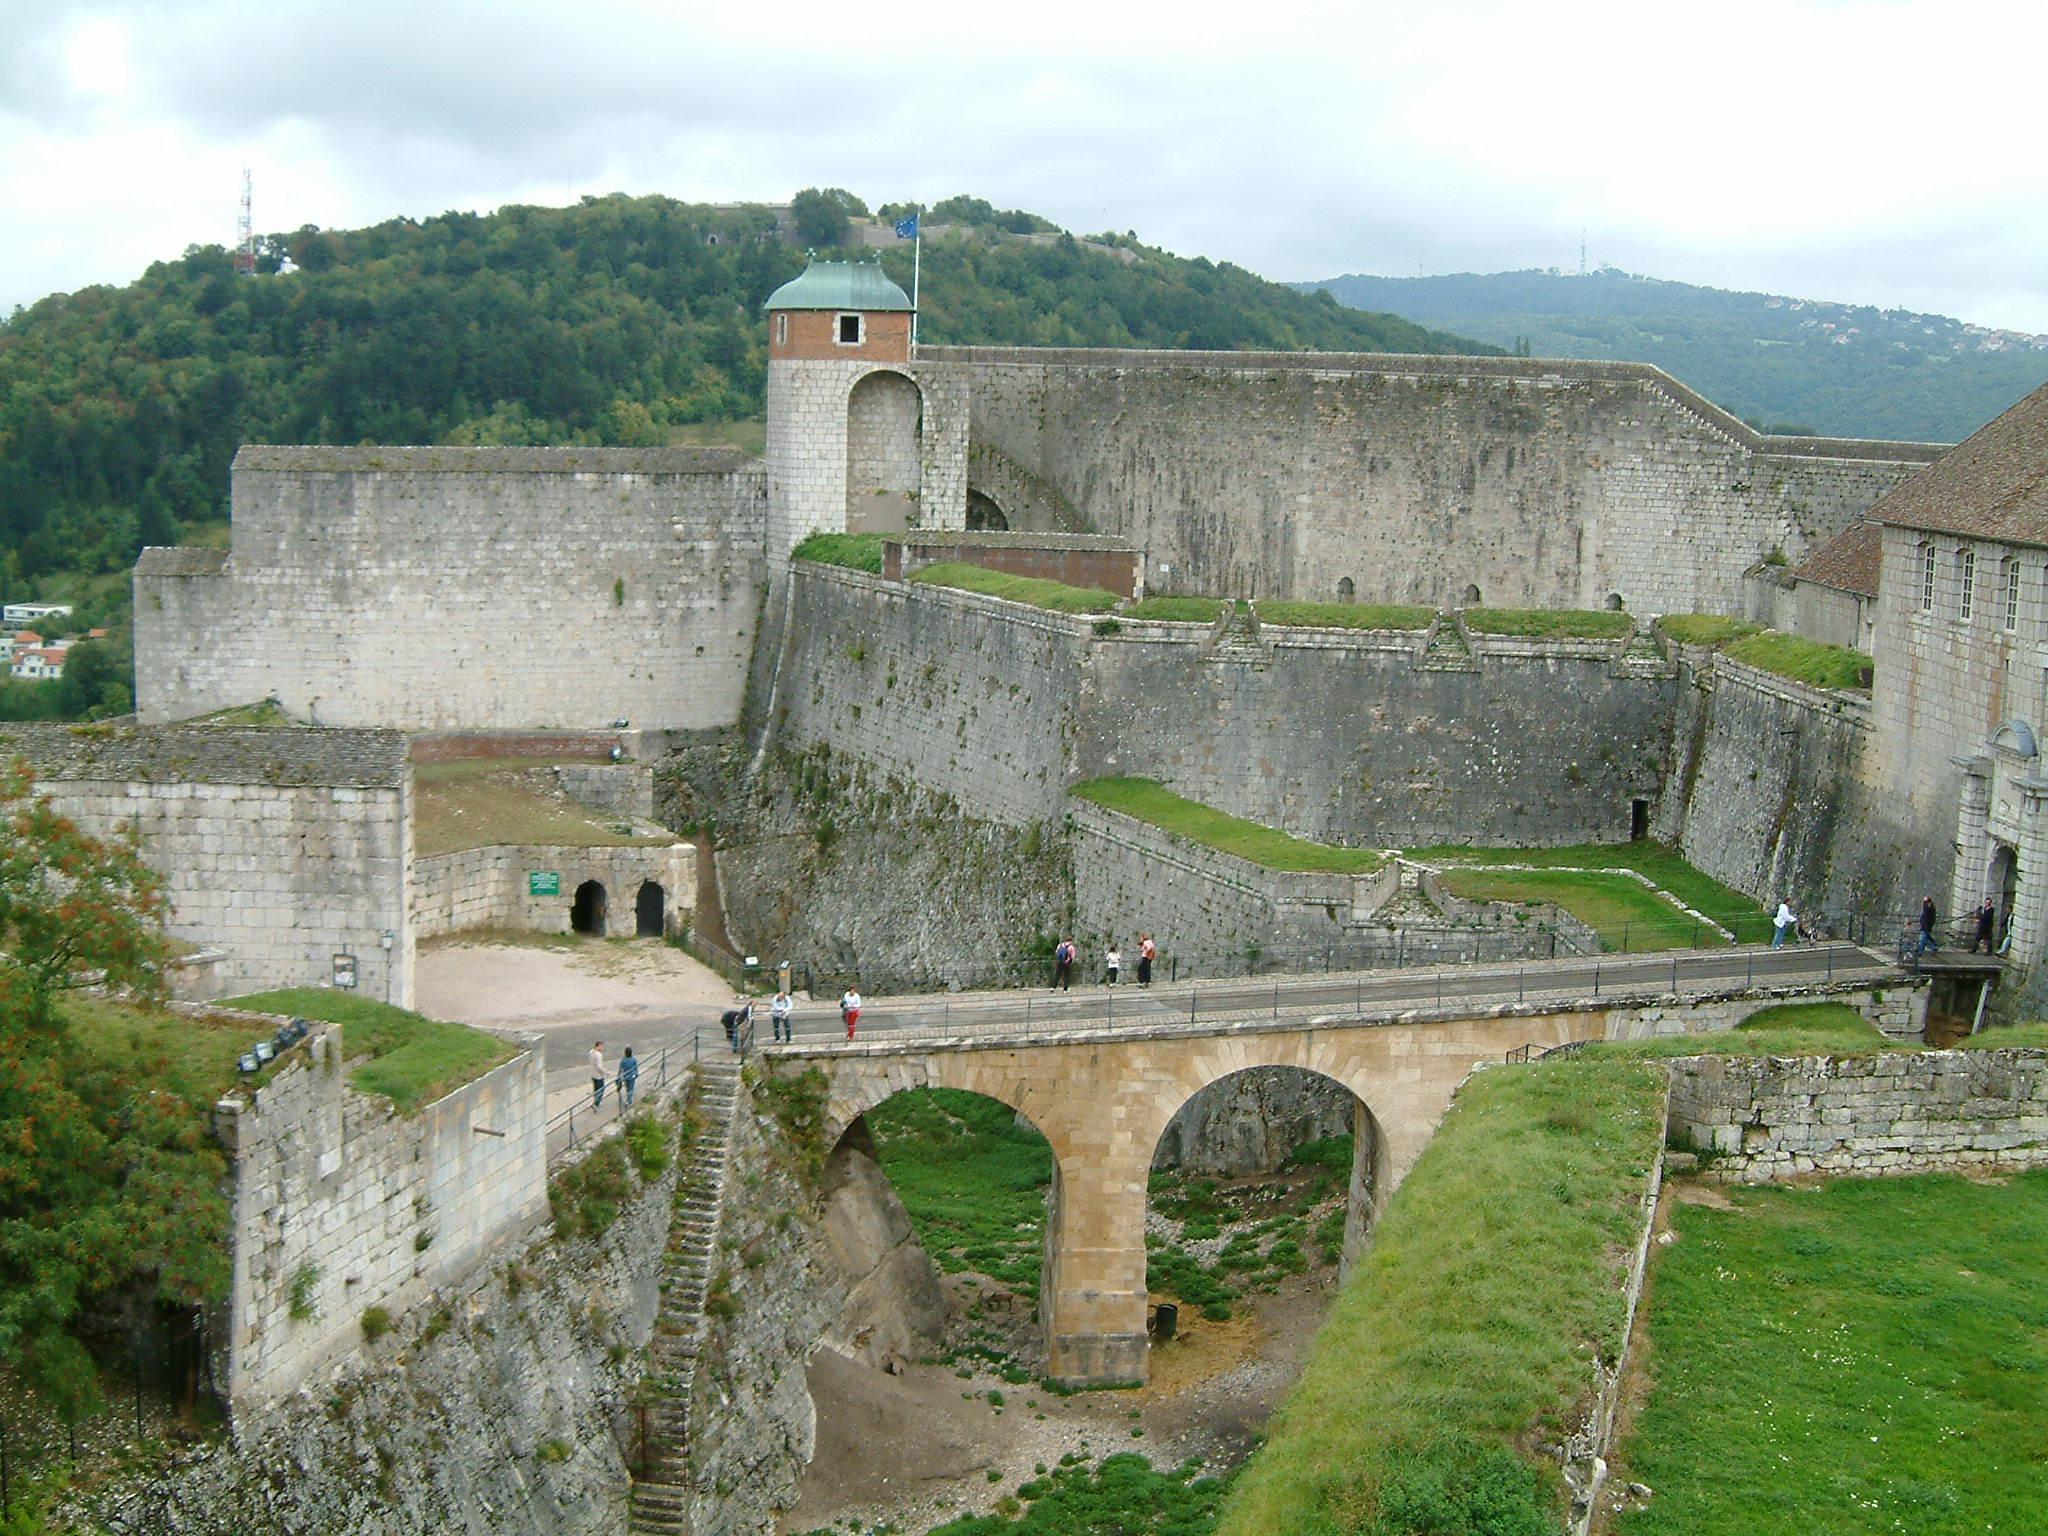 The Citadel of Besançon by Vauban